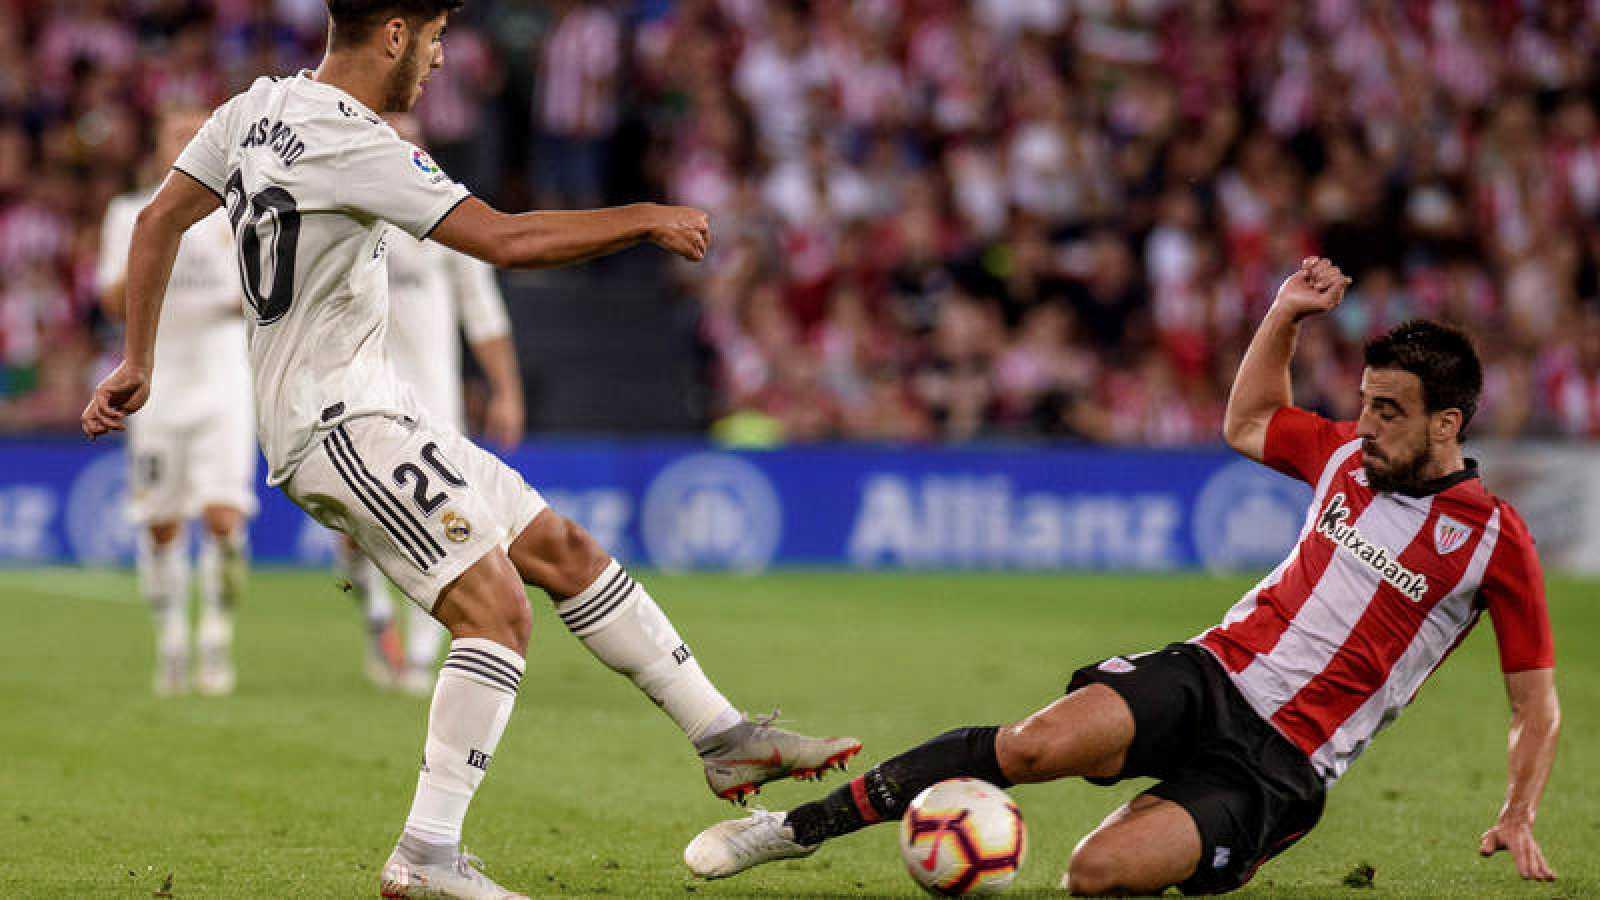 Marco Asensio pugna con Beñat durante un partido en San Mamés.